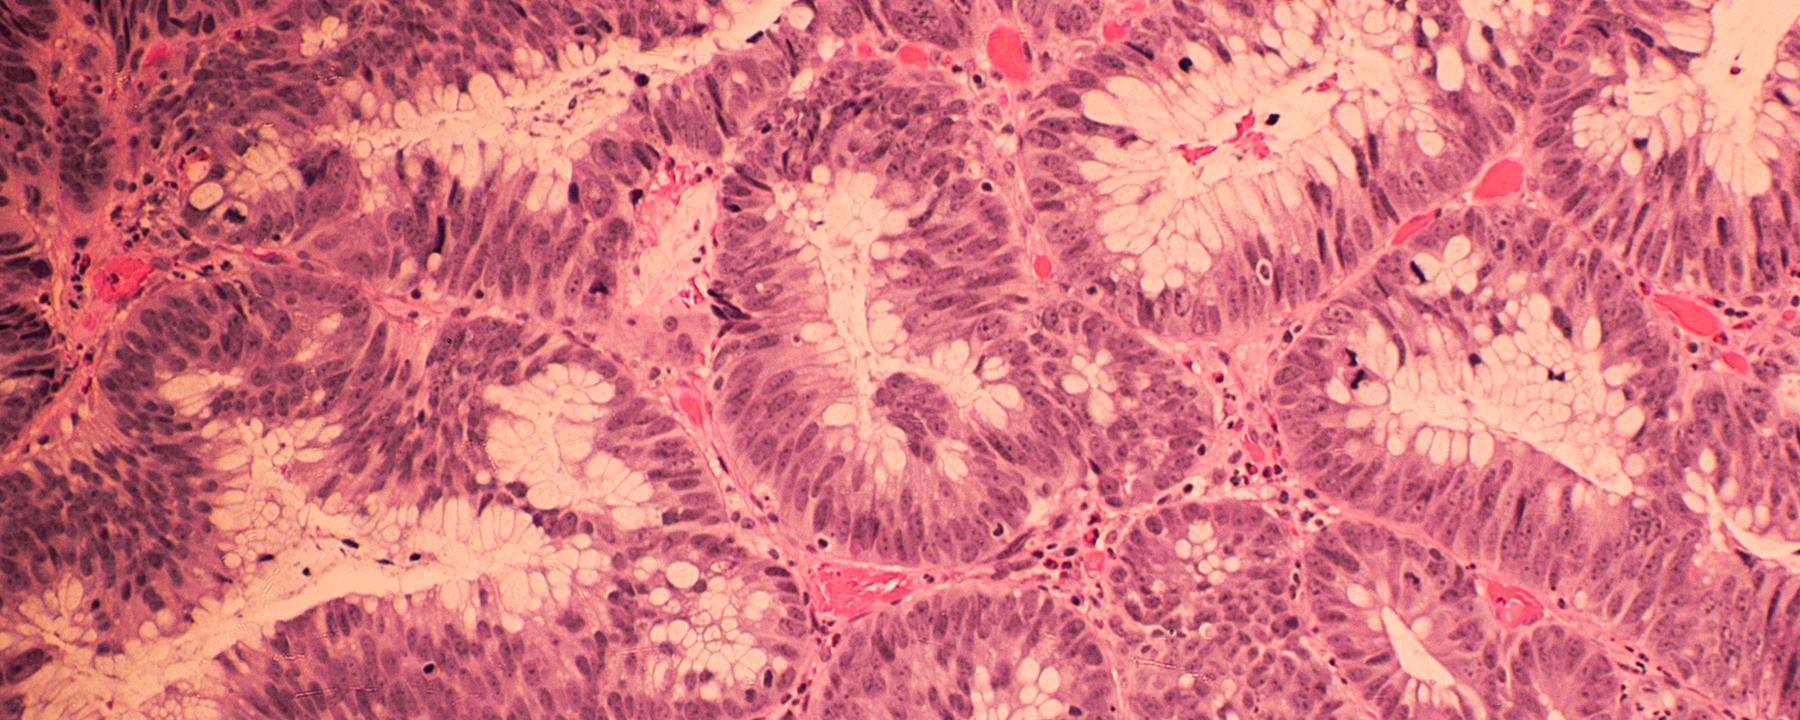 Colon Cancer Uses a Regenerative Playbook to Metastasize